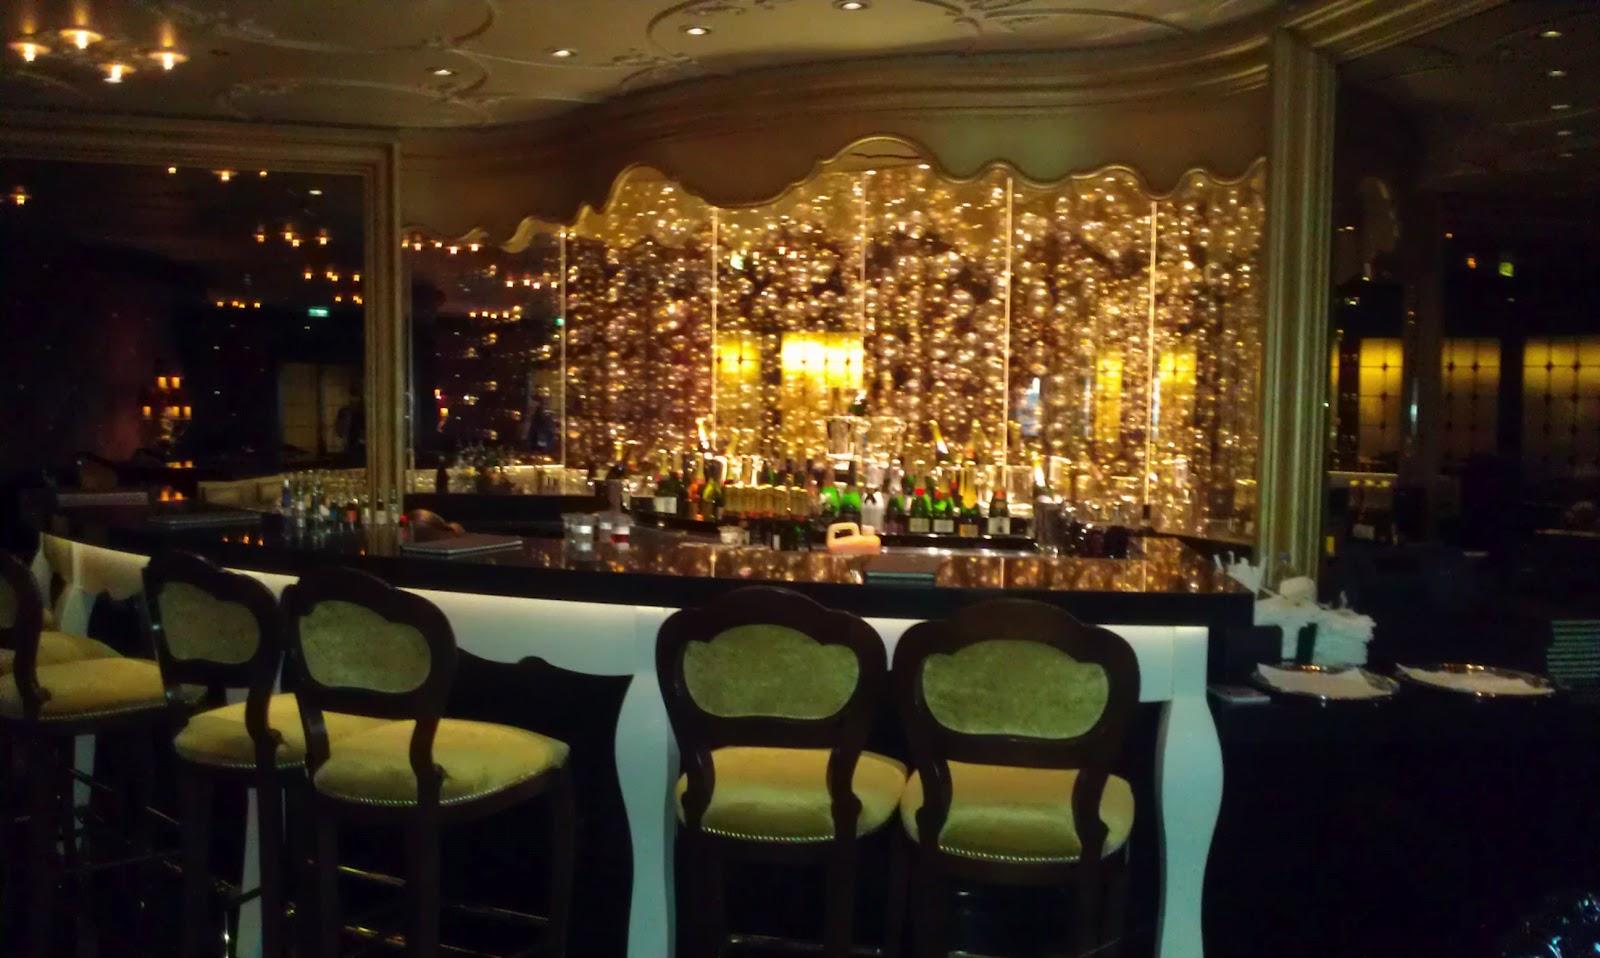 Ooh La La champagne bar Disney Fantasy Cruise ship